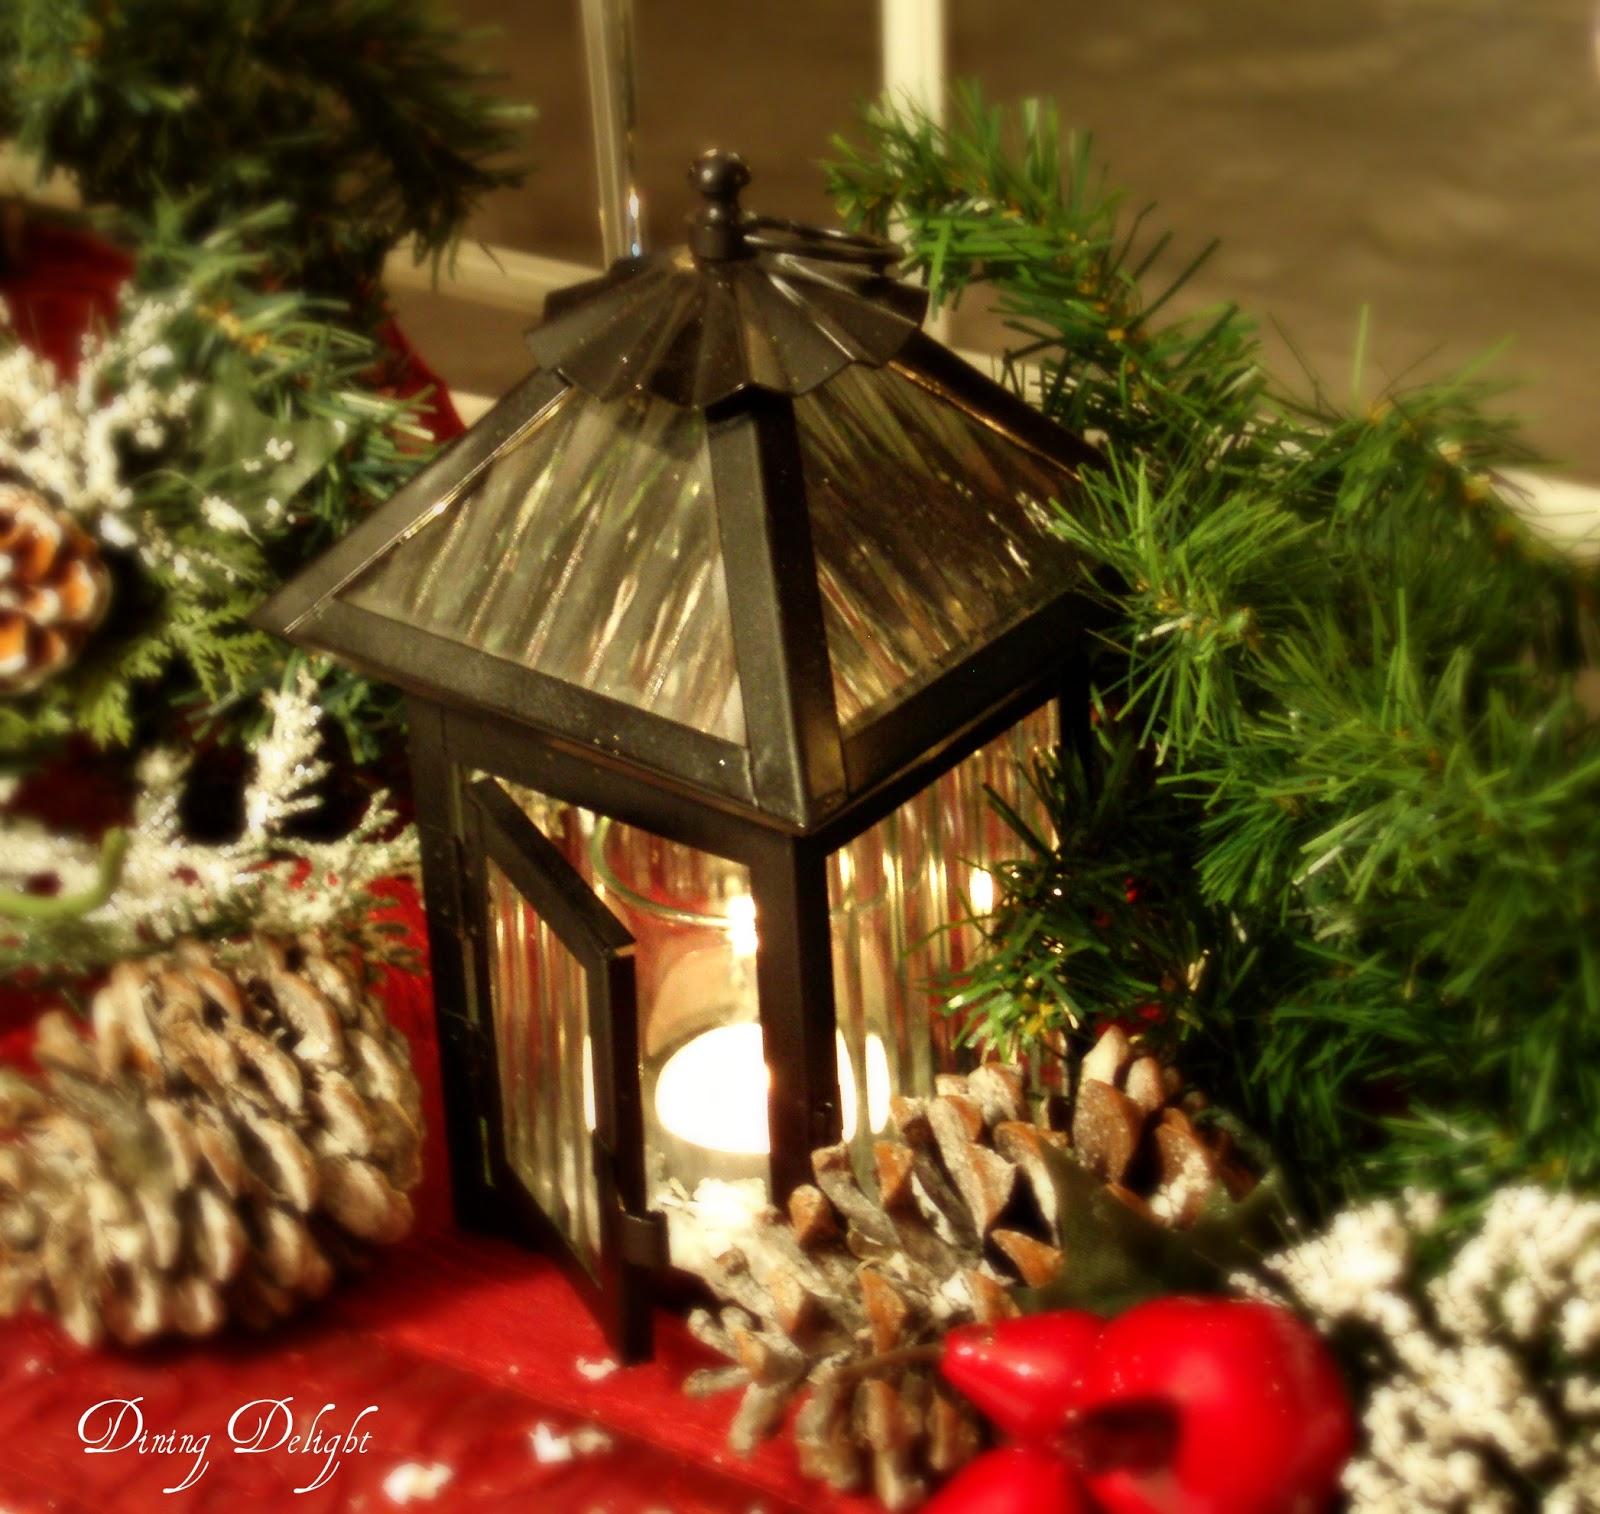 Dining Delight Christmas Lantern Buffet : BlackChristmasLantern from dining-delight.blogspot.com size 1600 x 1514 jpeg 325kB